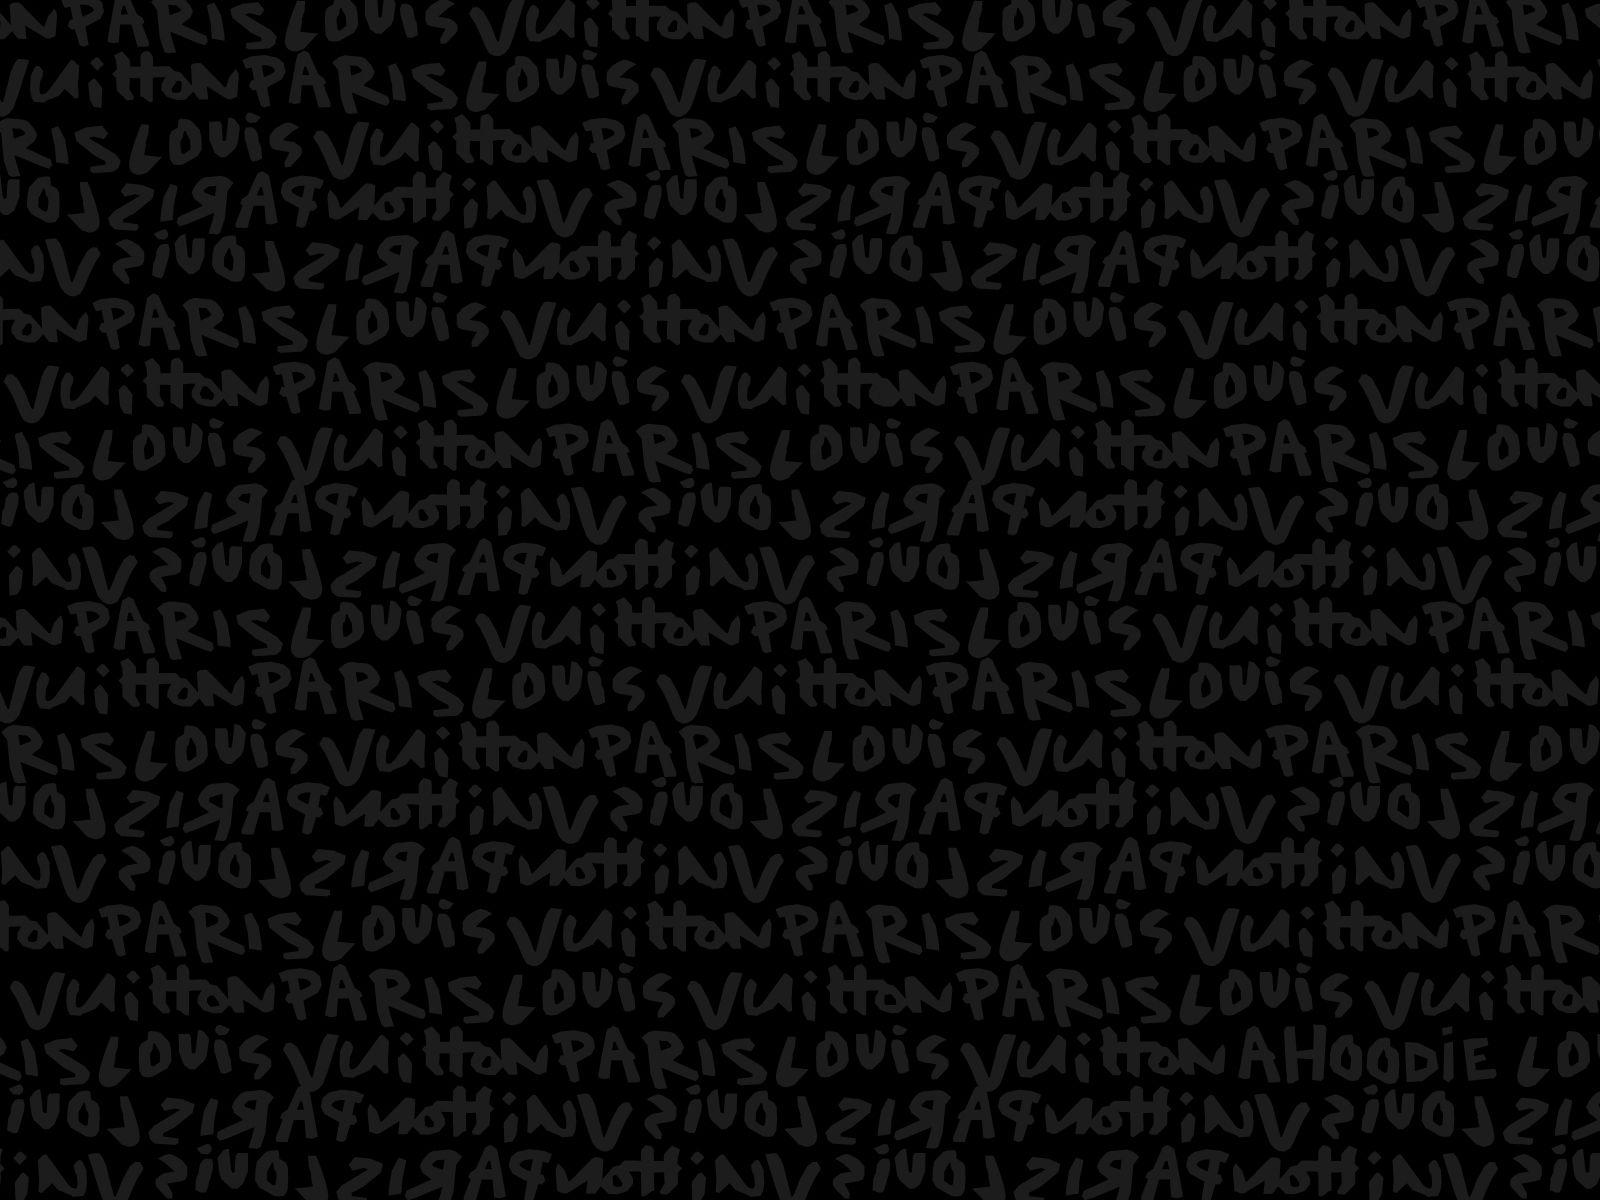 Black Louis Vuitton Iphone Wallpapers On Wallpaperdog